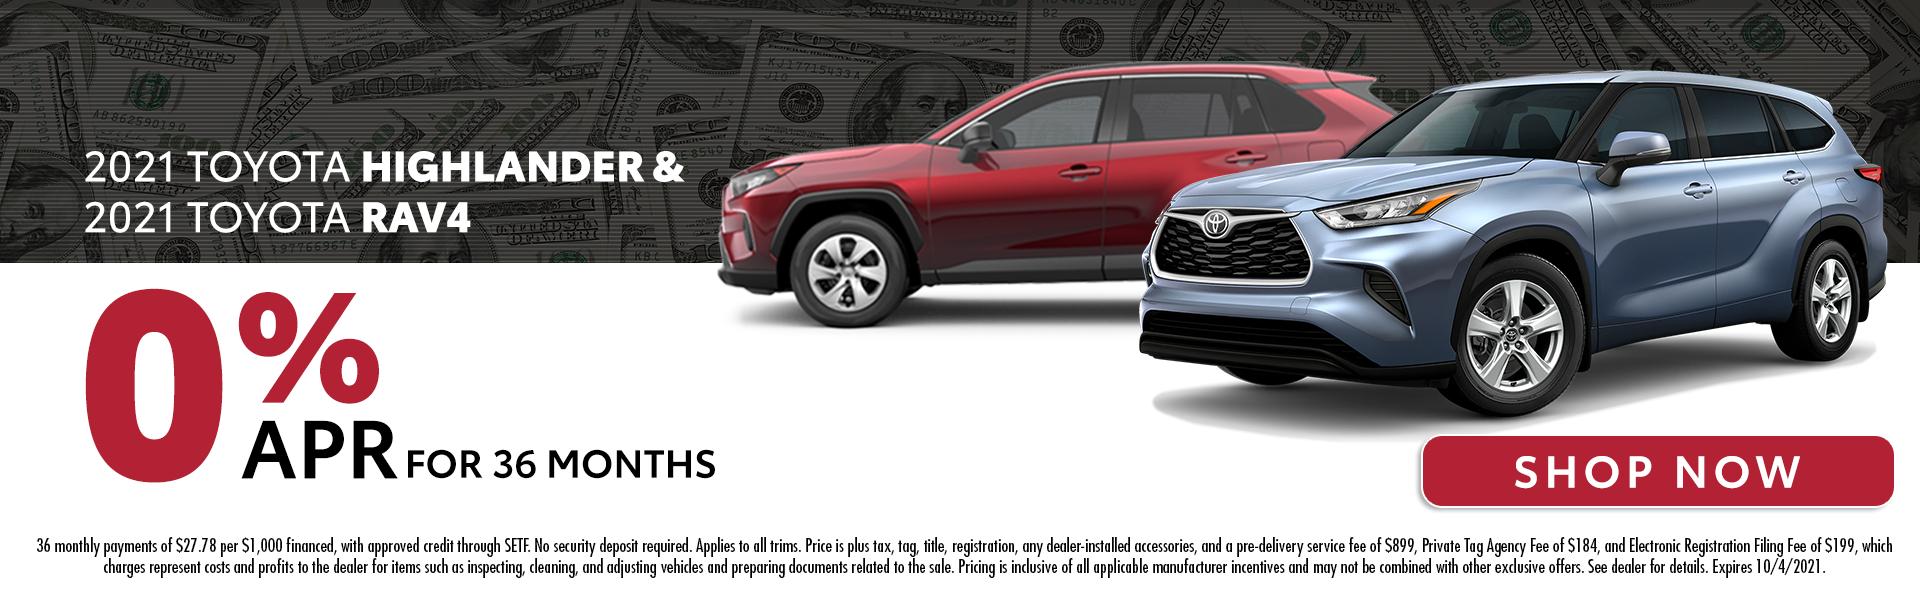 2021 Toyota Highlander & 2021 Toyota RAV4 | 0% APR For 36 Months